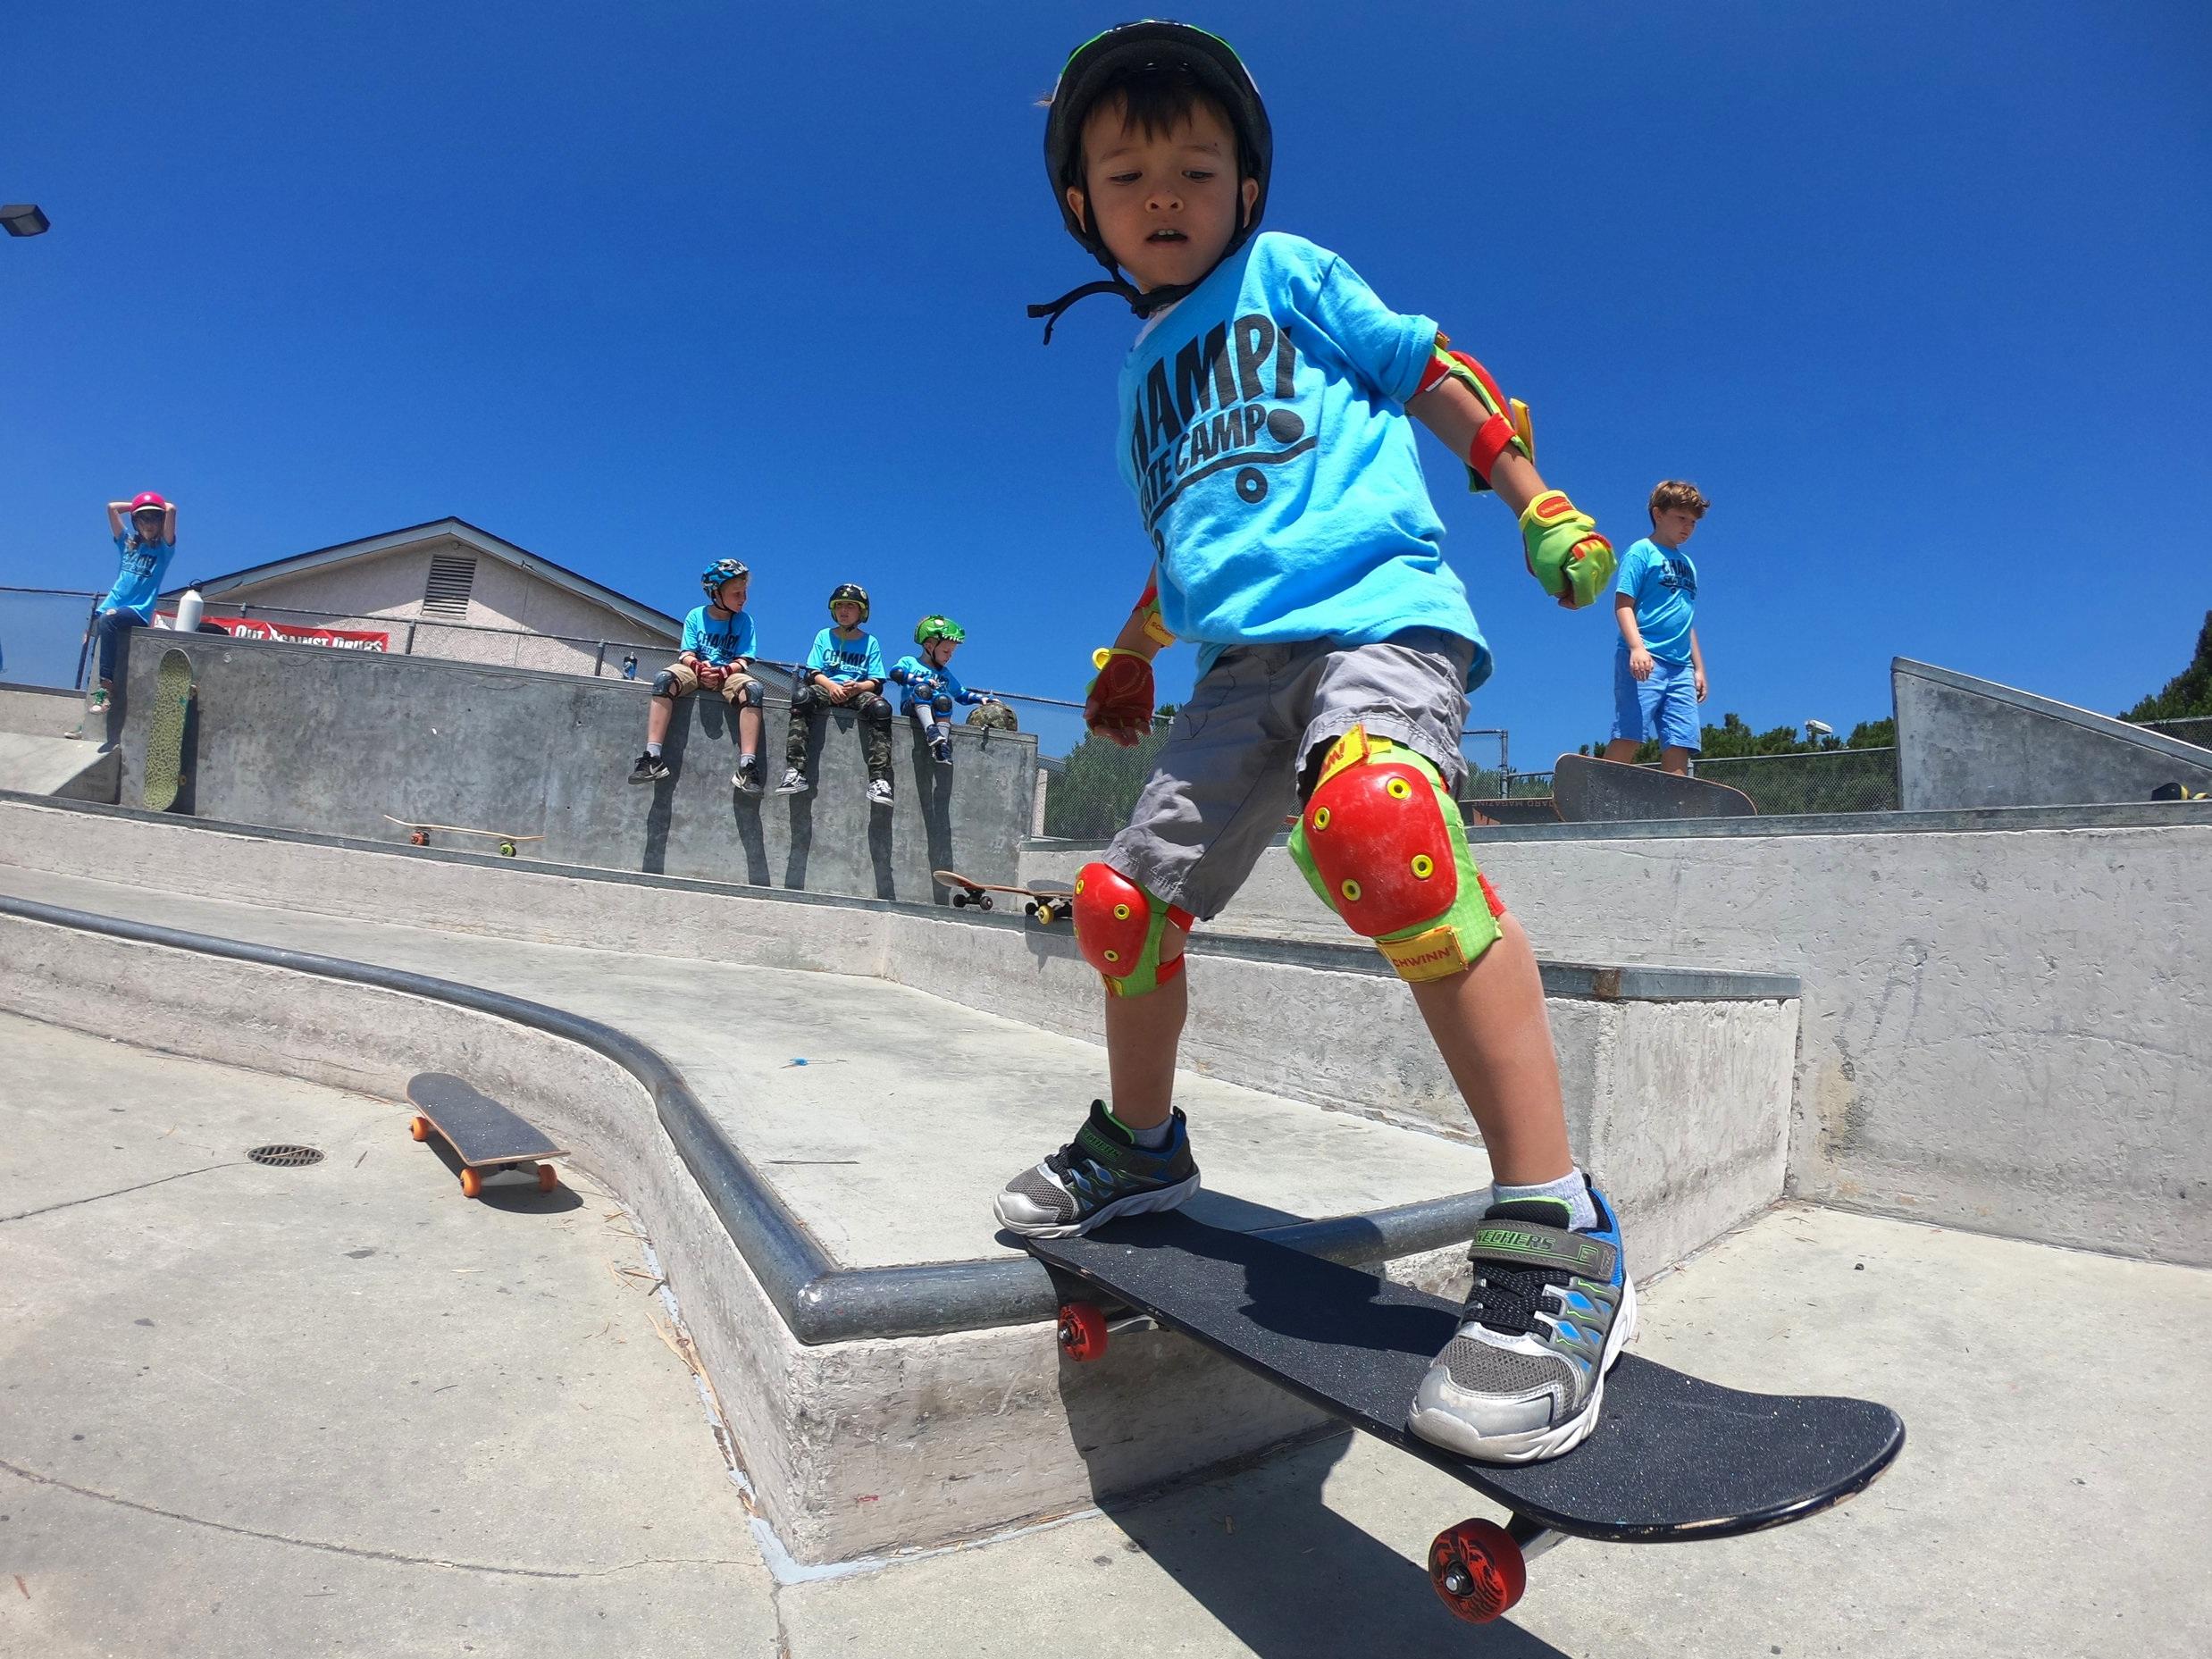 champ skate camp tail drop el segundo skate park grom